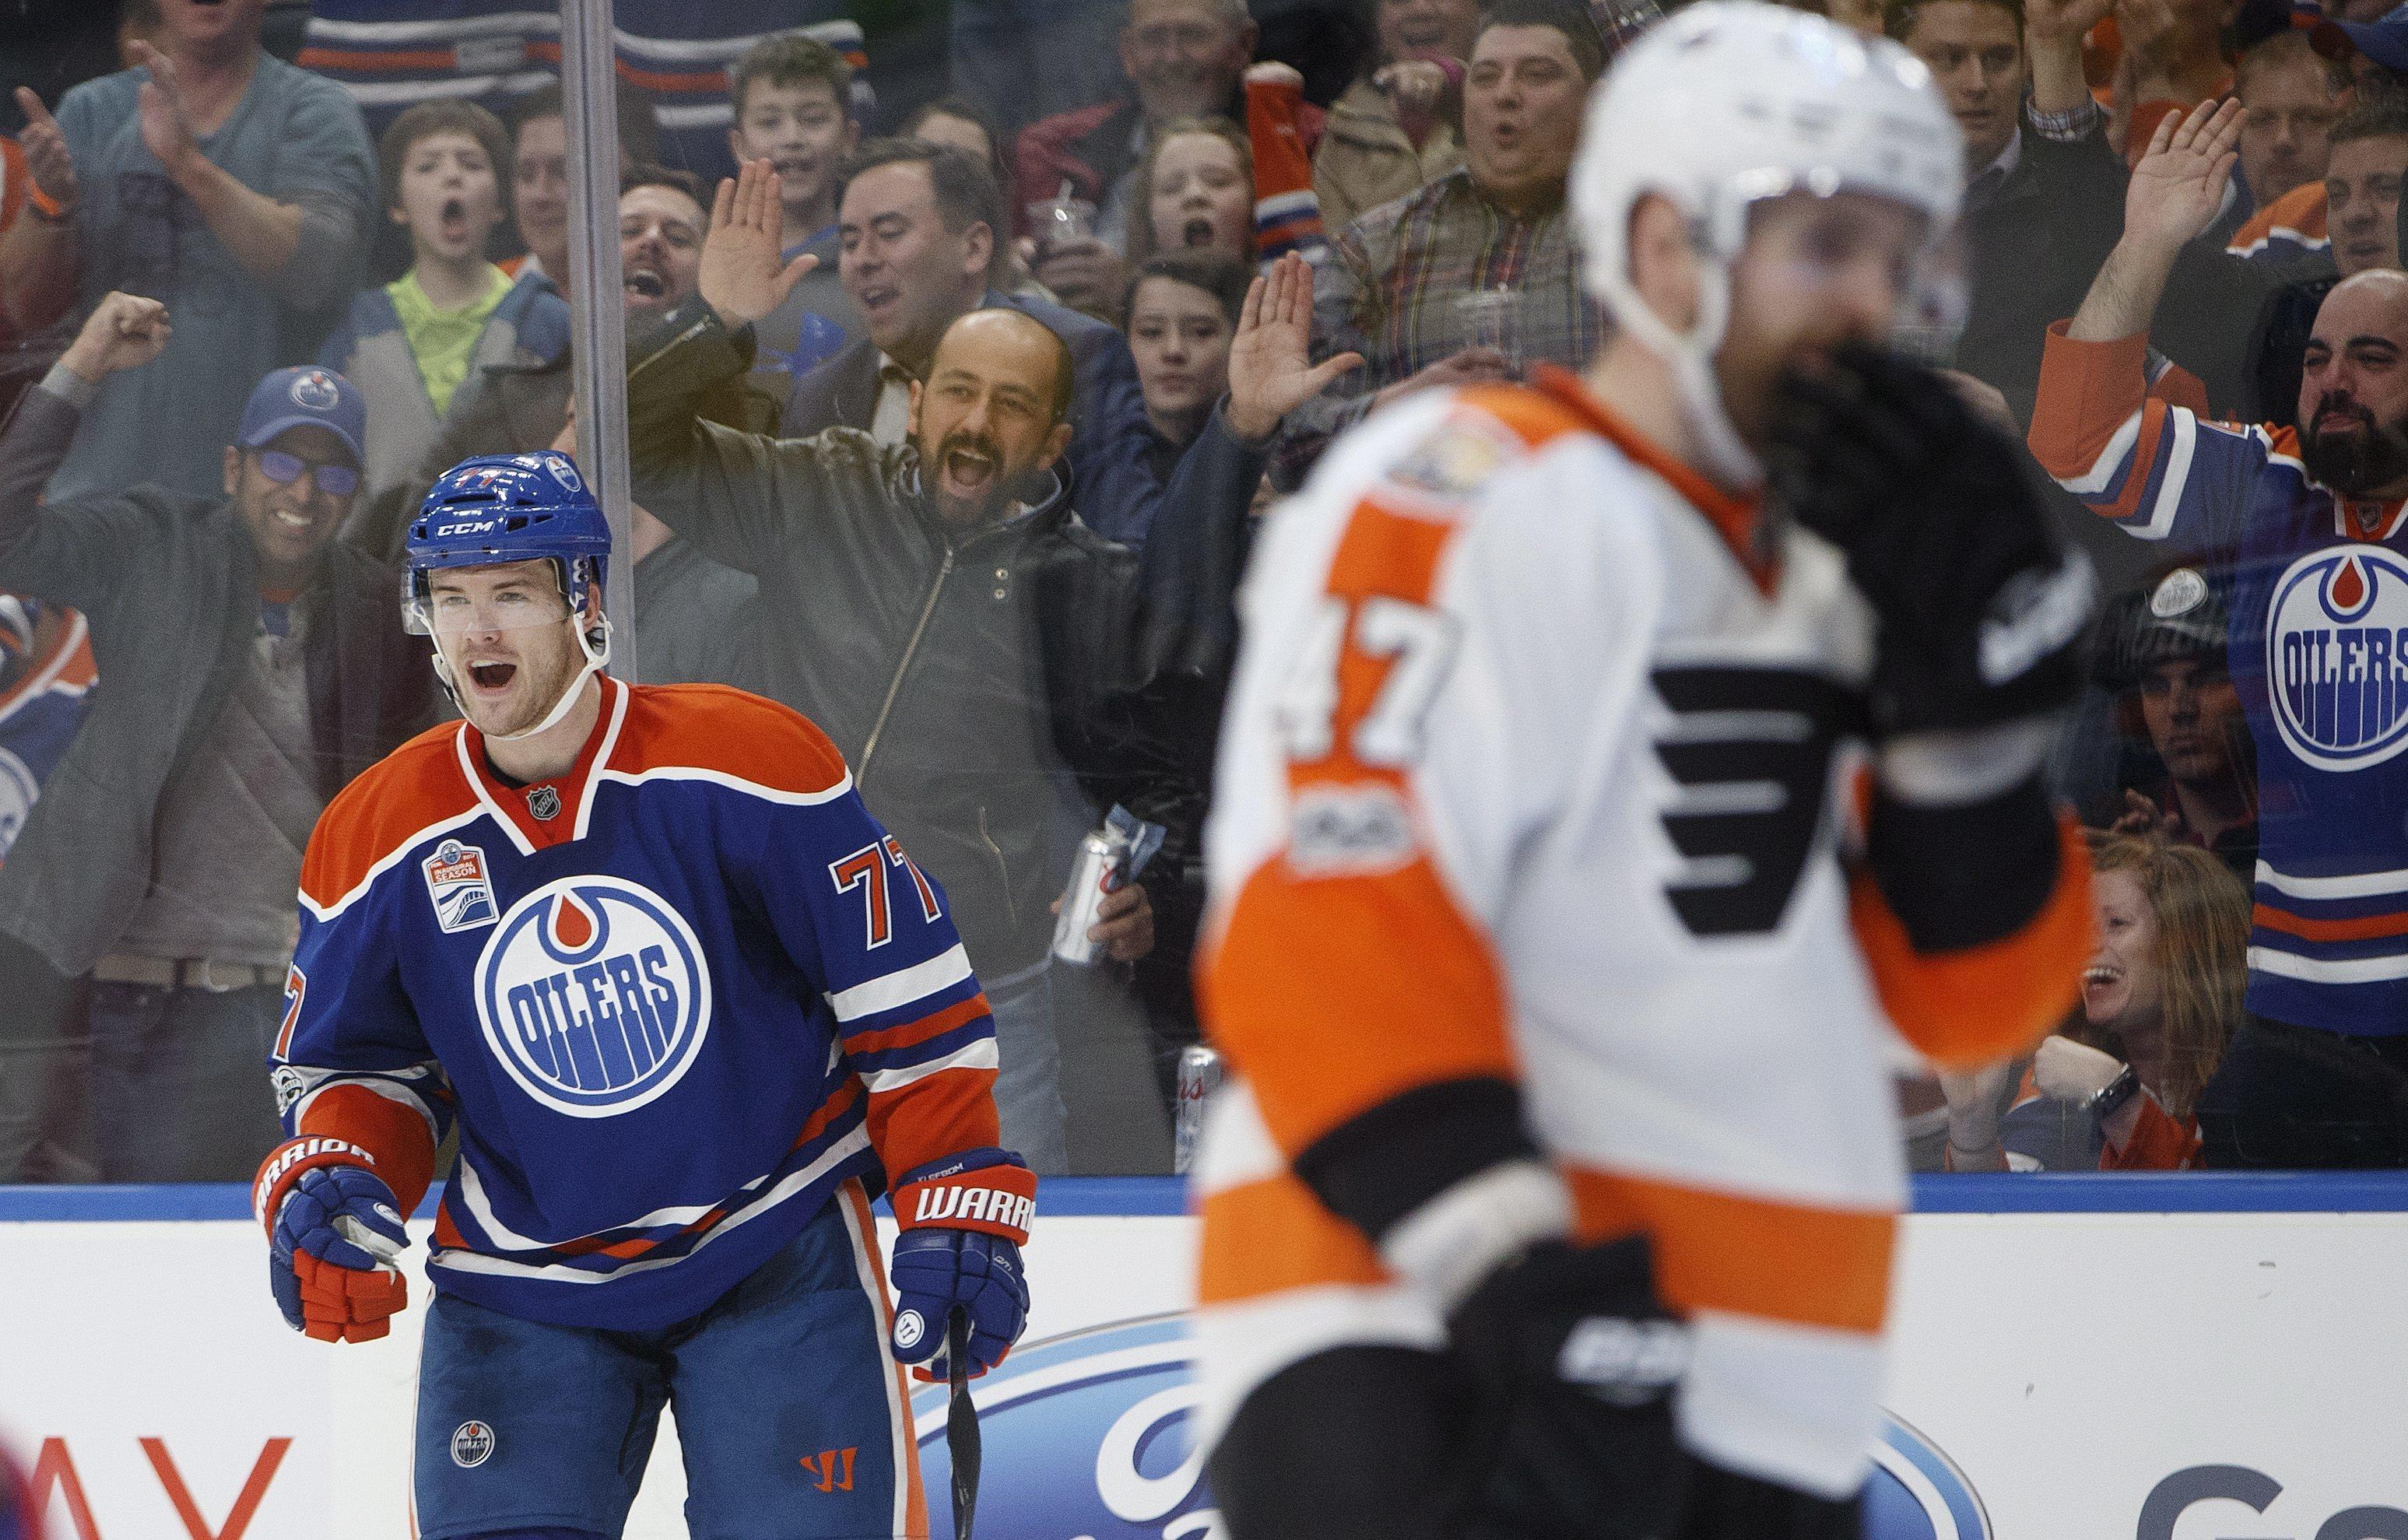 Flyers_oilers_hockey_35074